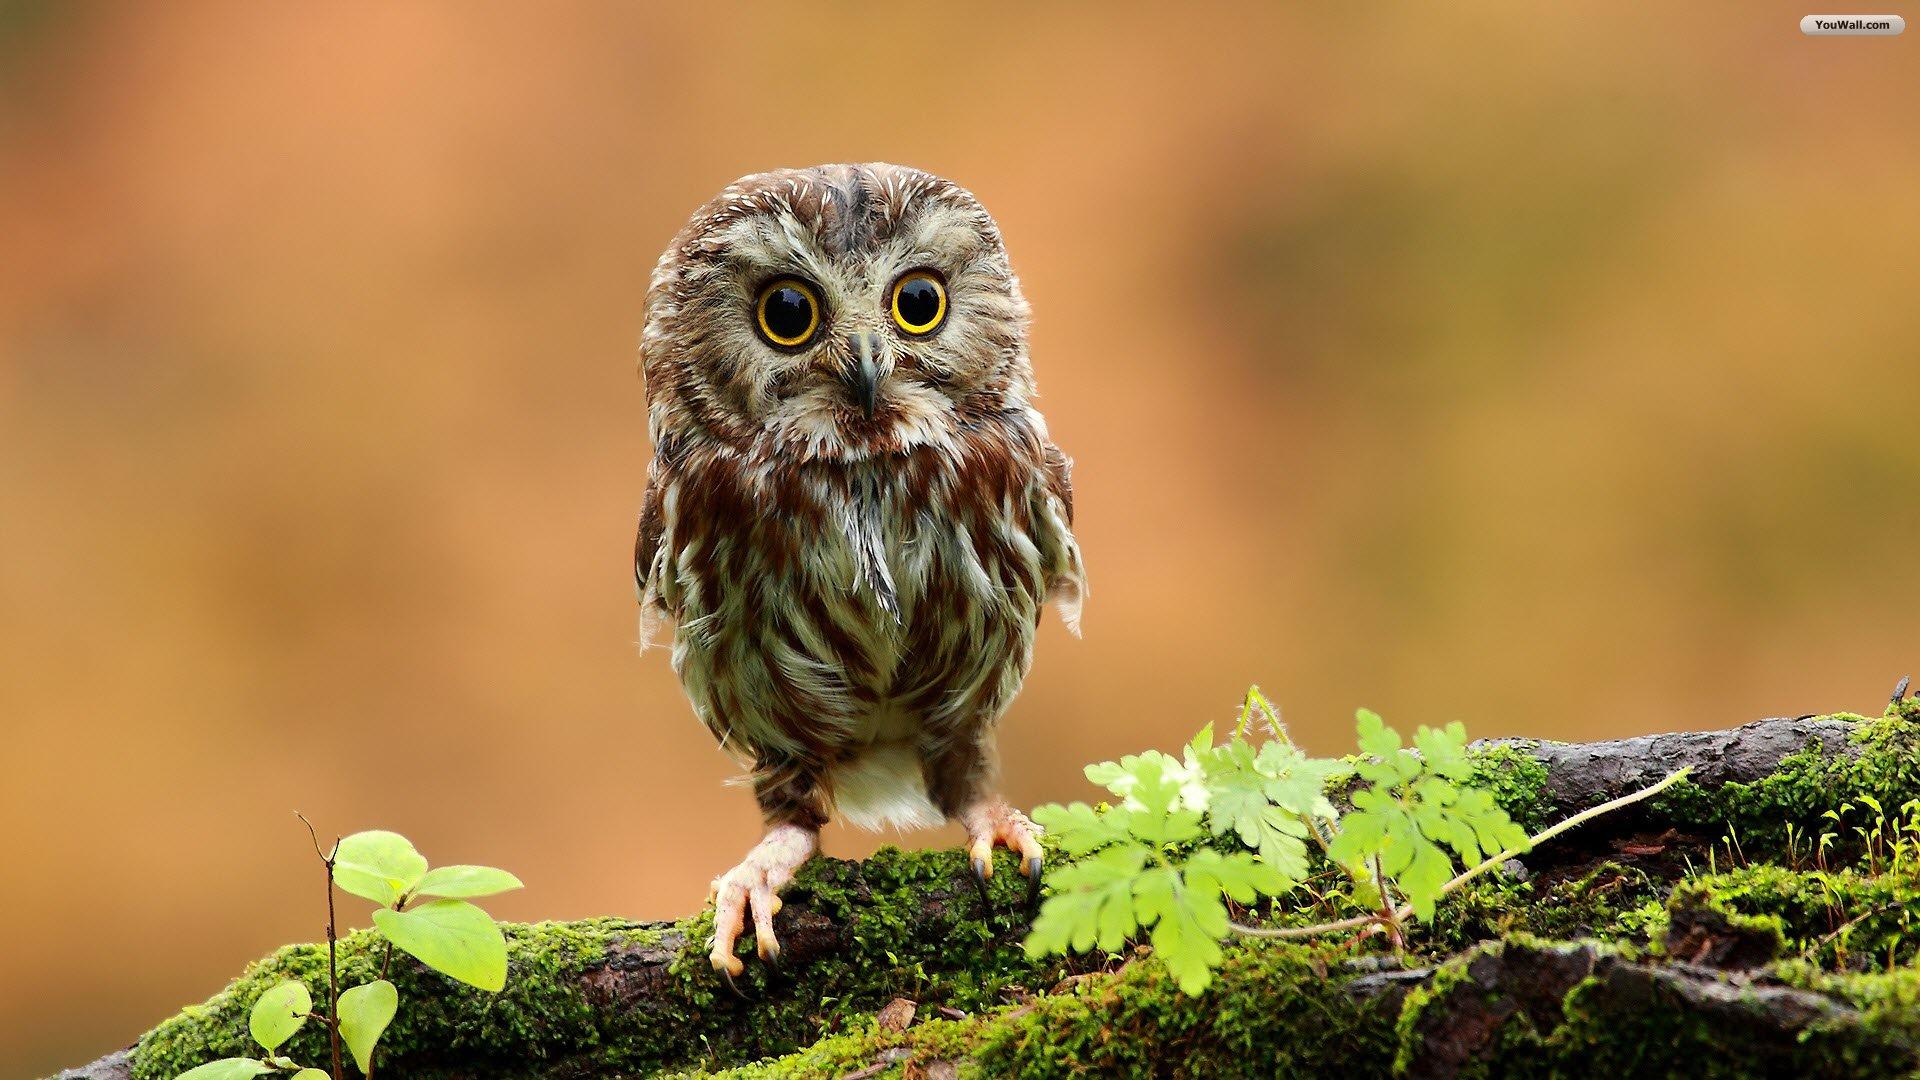 1000 Ideas About Cute Owls Wallpaper On Pinterest